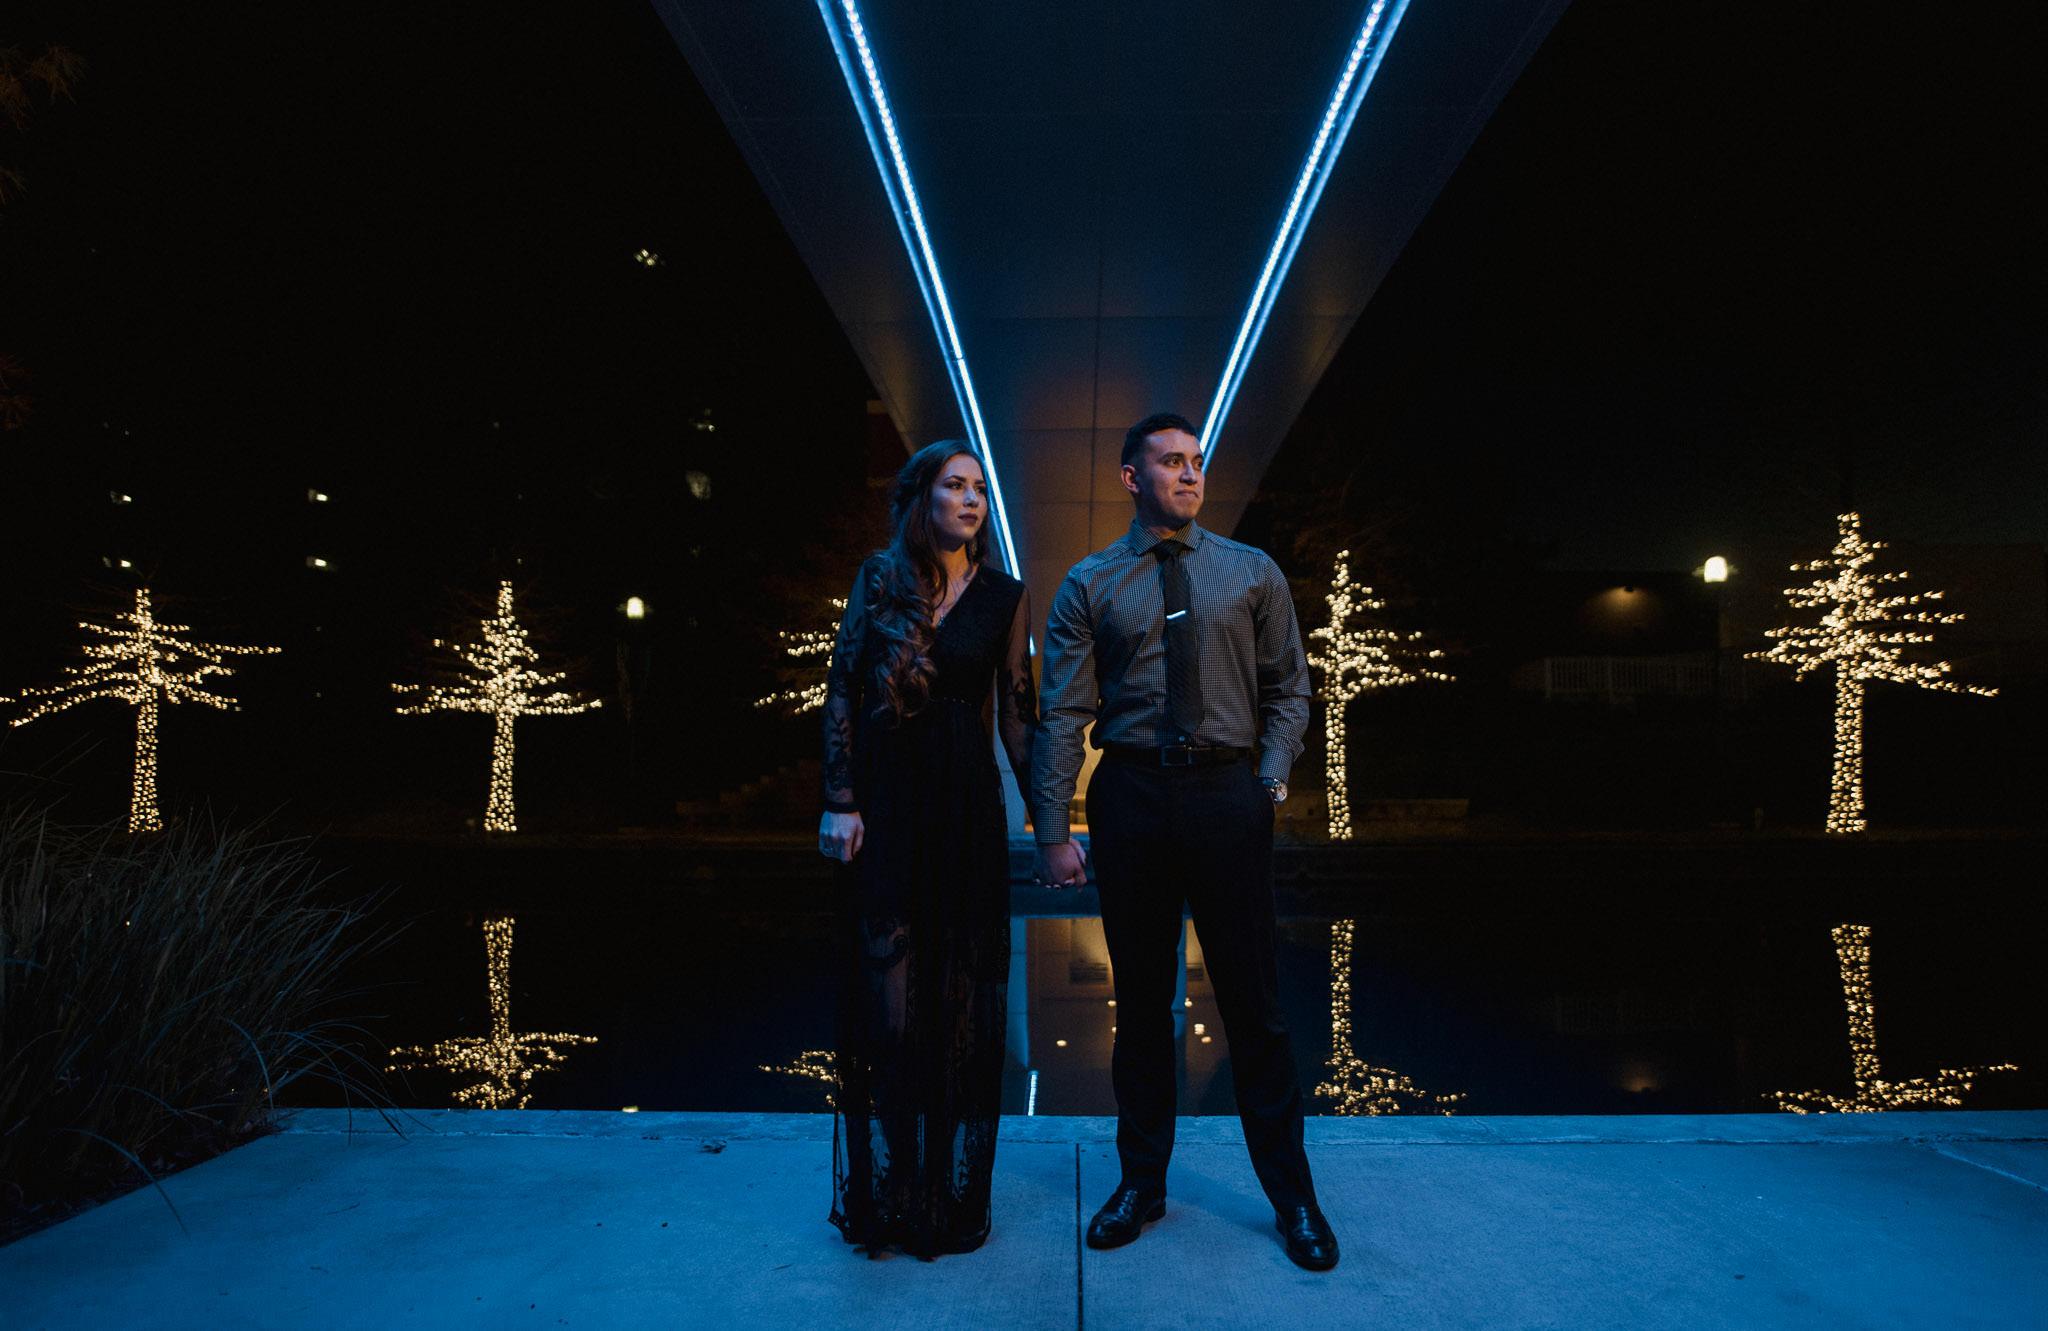 woodlands-houston-waterway-night-enchanted-romantic-engagement-photographer